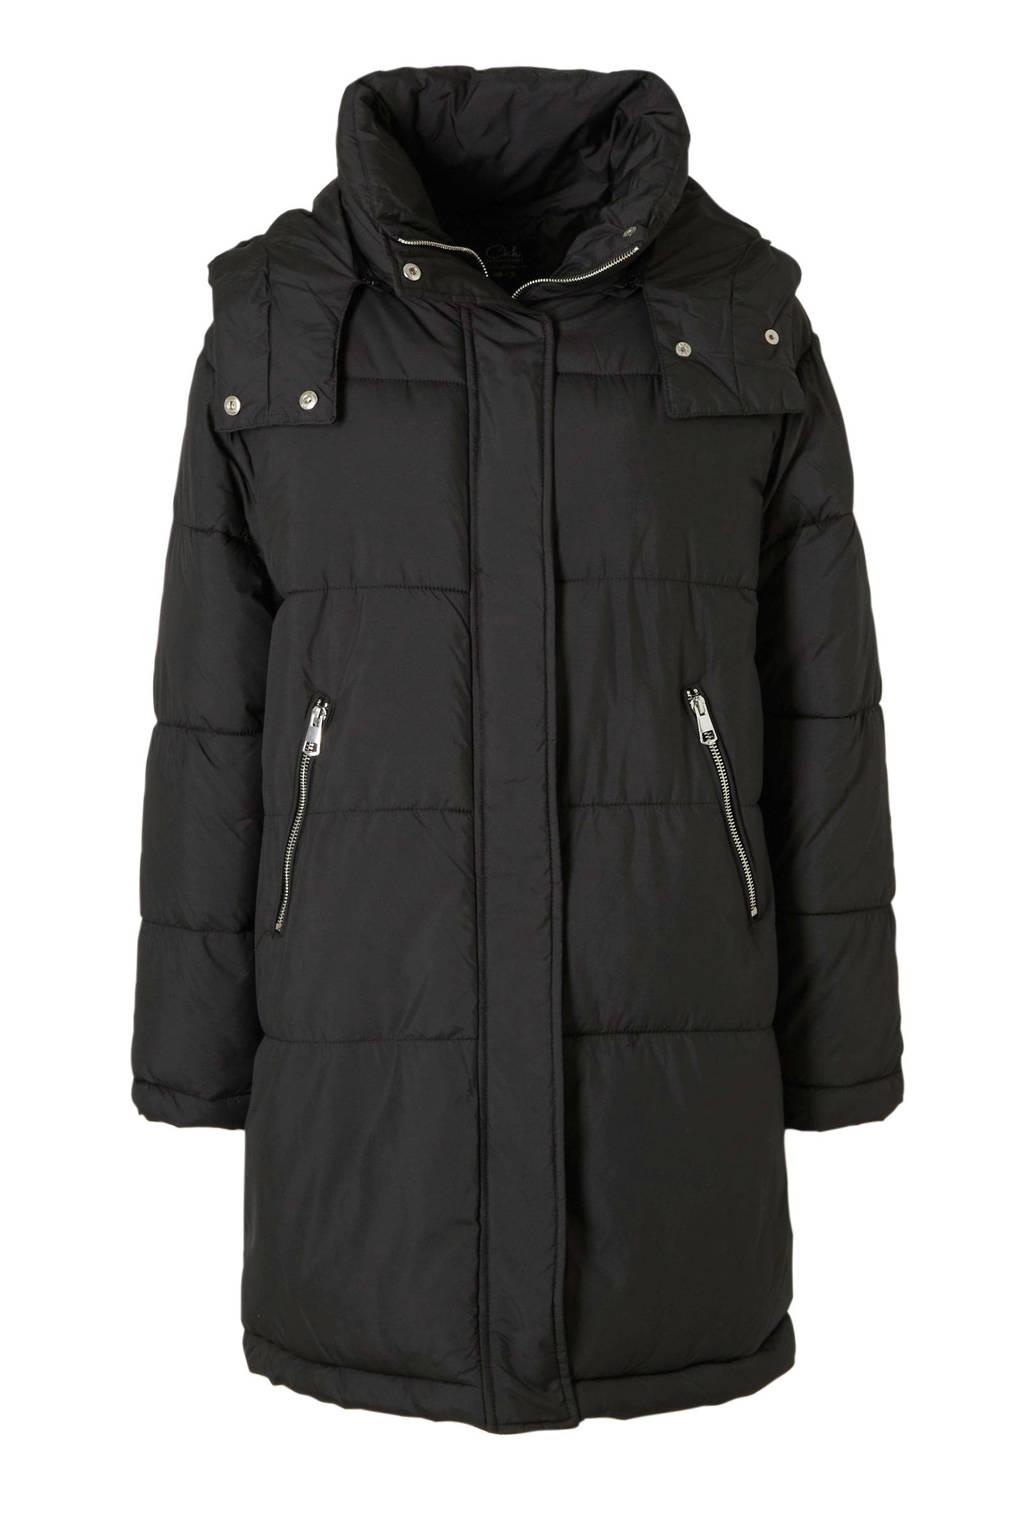 C&A Clockhouse gewatteerde jas zwart, Zwart